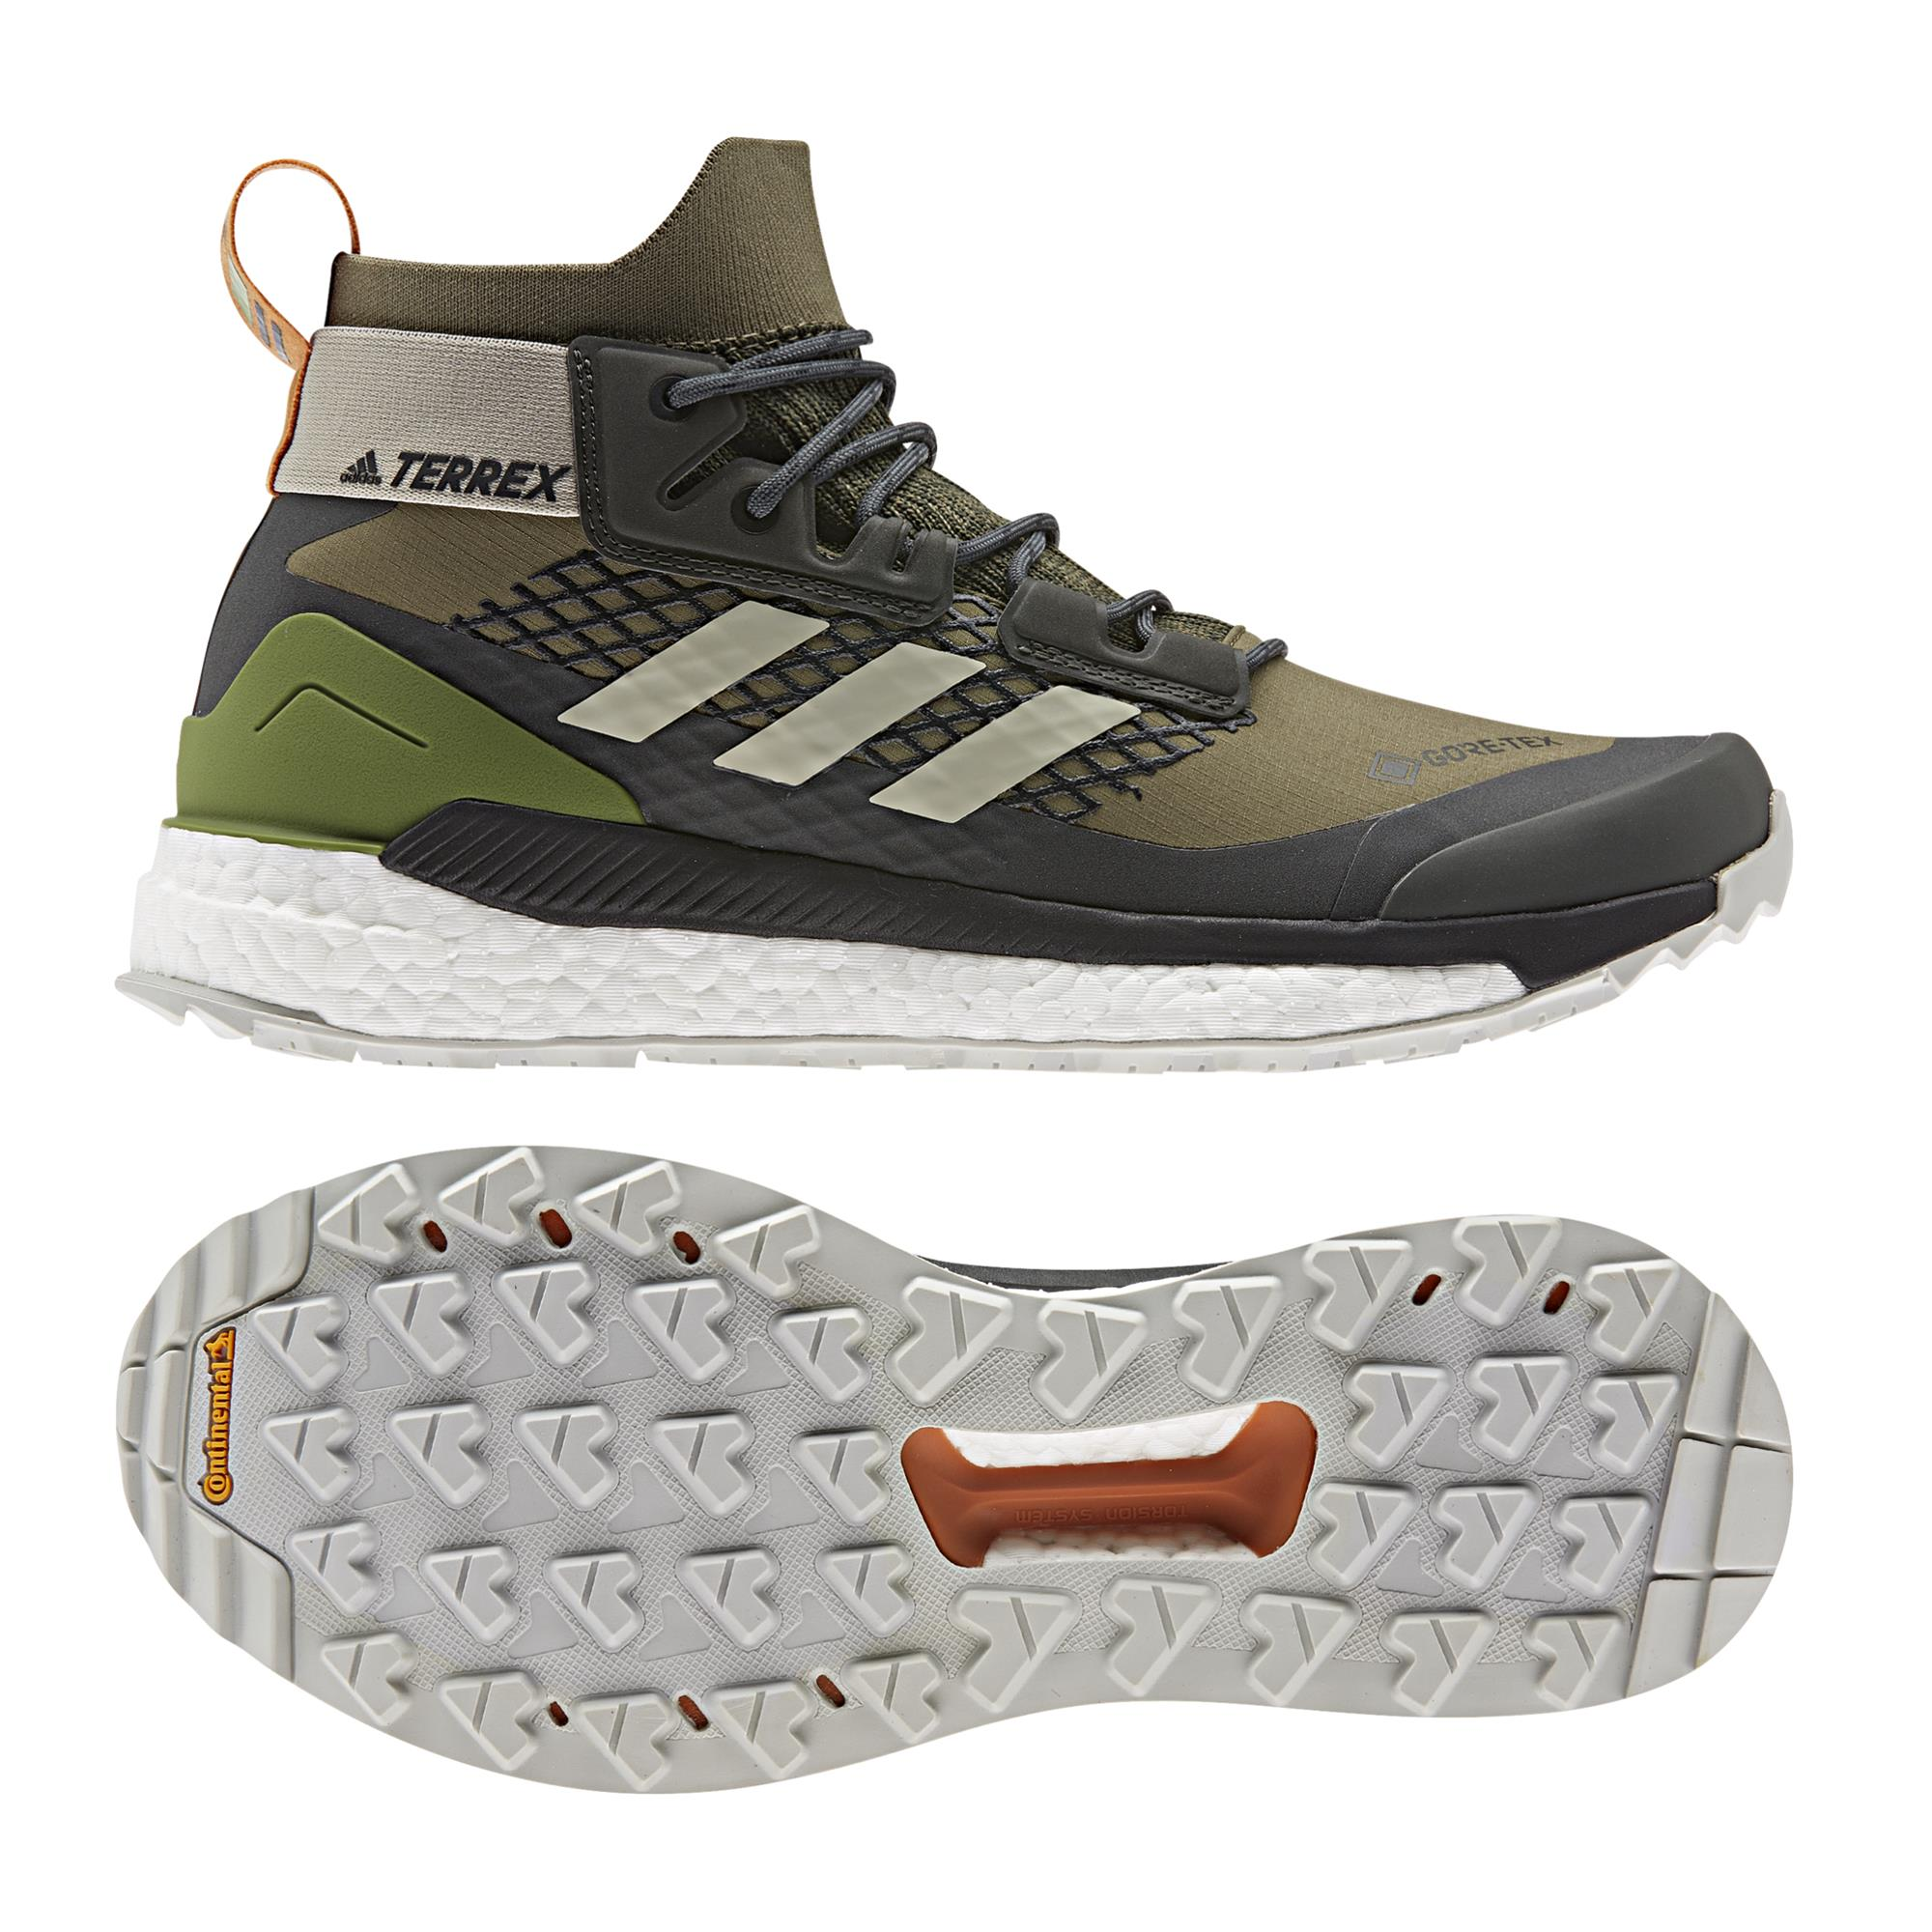 Adidas Terrex Free Hiker G Herren Wander- und Freizeitschuhe olive,raw khaki/sesame/tecoli Gr. 46,0 EU